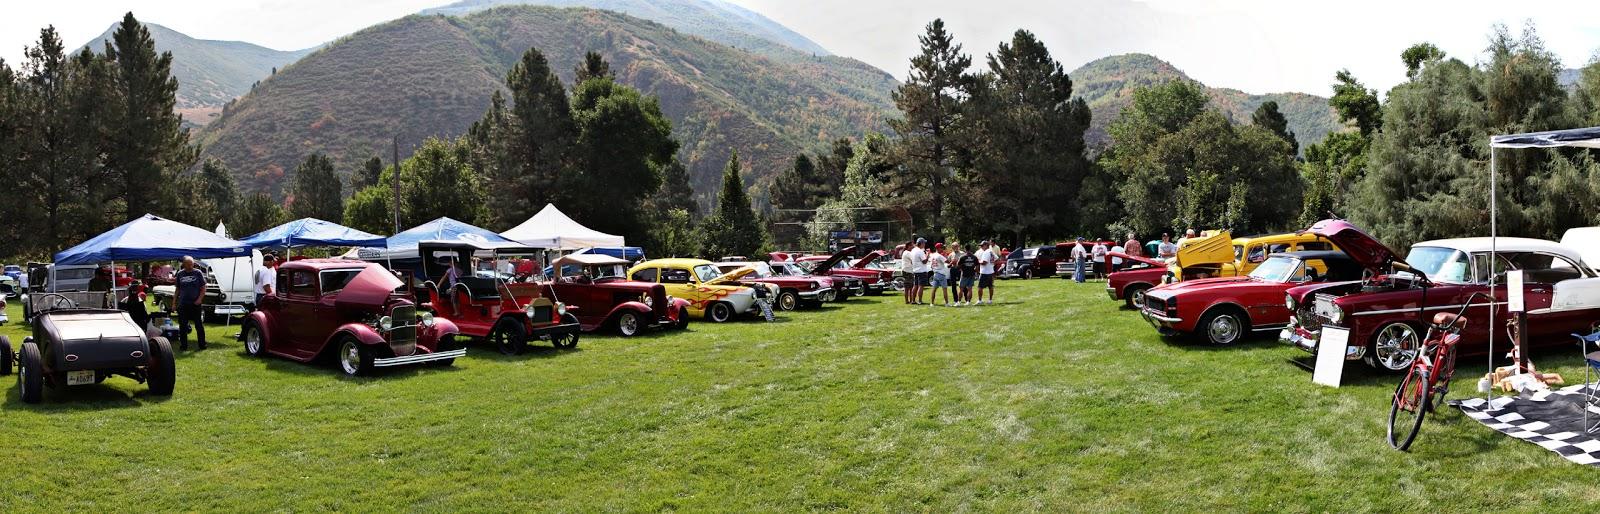 Sunday In The Park Car Show Springville Utah